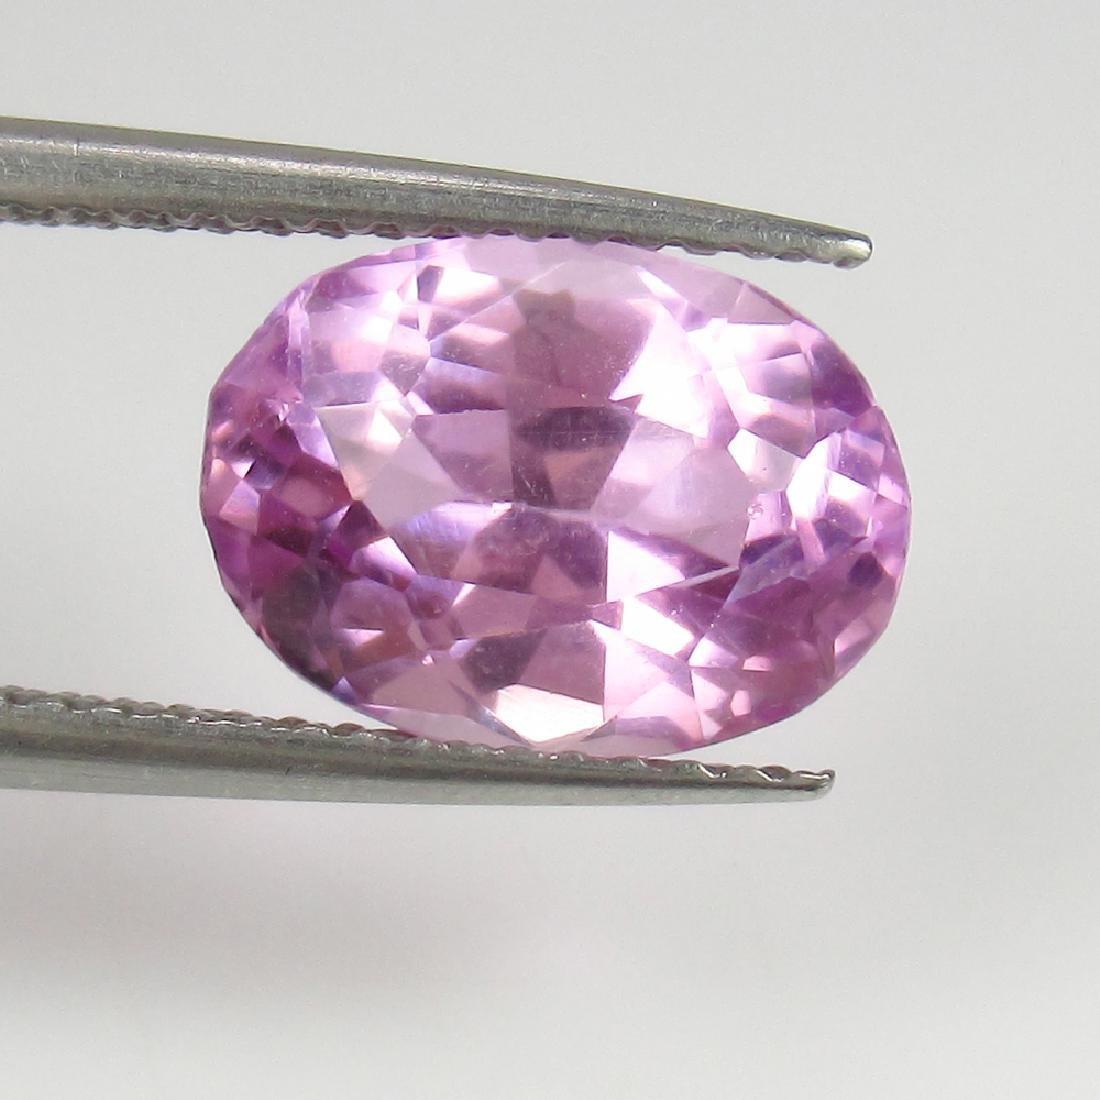 3.55 Ct IGI Certified Genuine Brazil Pink Spodumene - 5